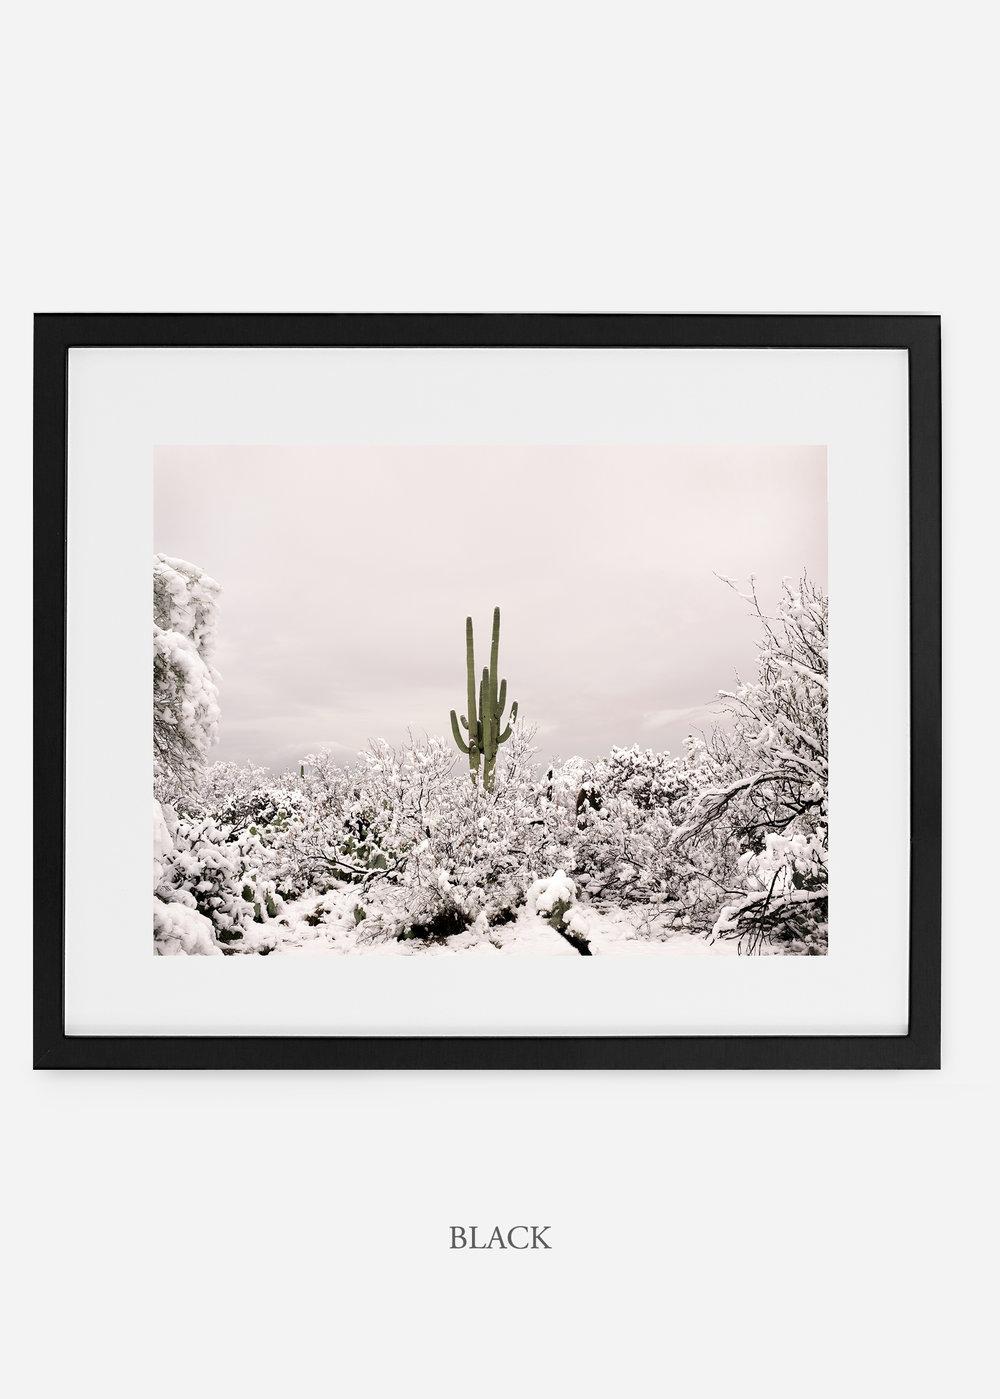 blackframe-saguaroNo.1-wildercalifornia-art-wallart-cactusprint-homedecor-prints-arizona-botanical-artwork-interiordesign.jpg